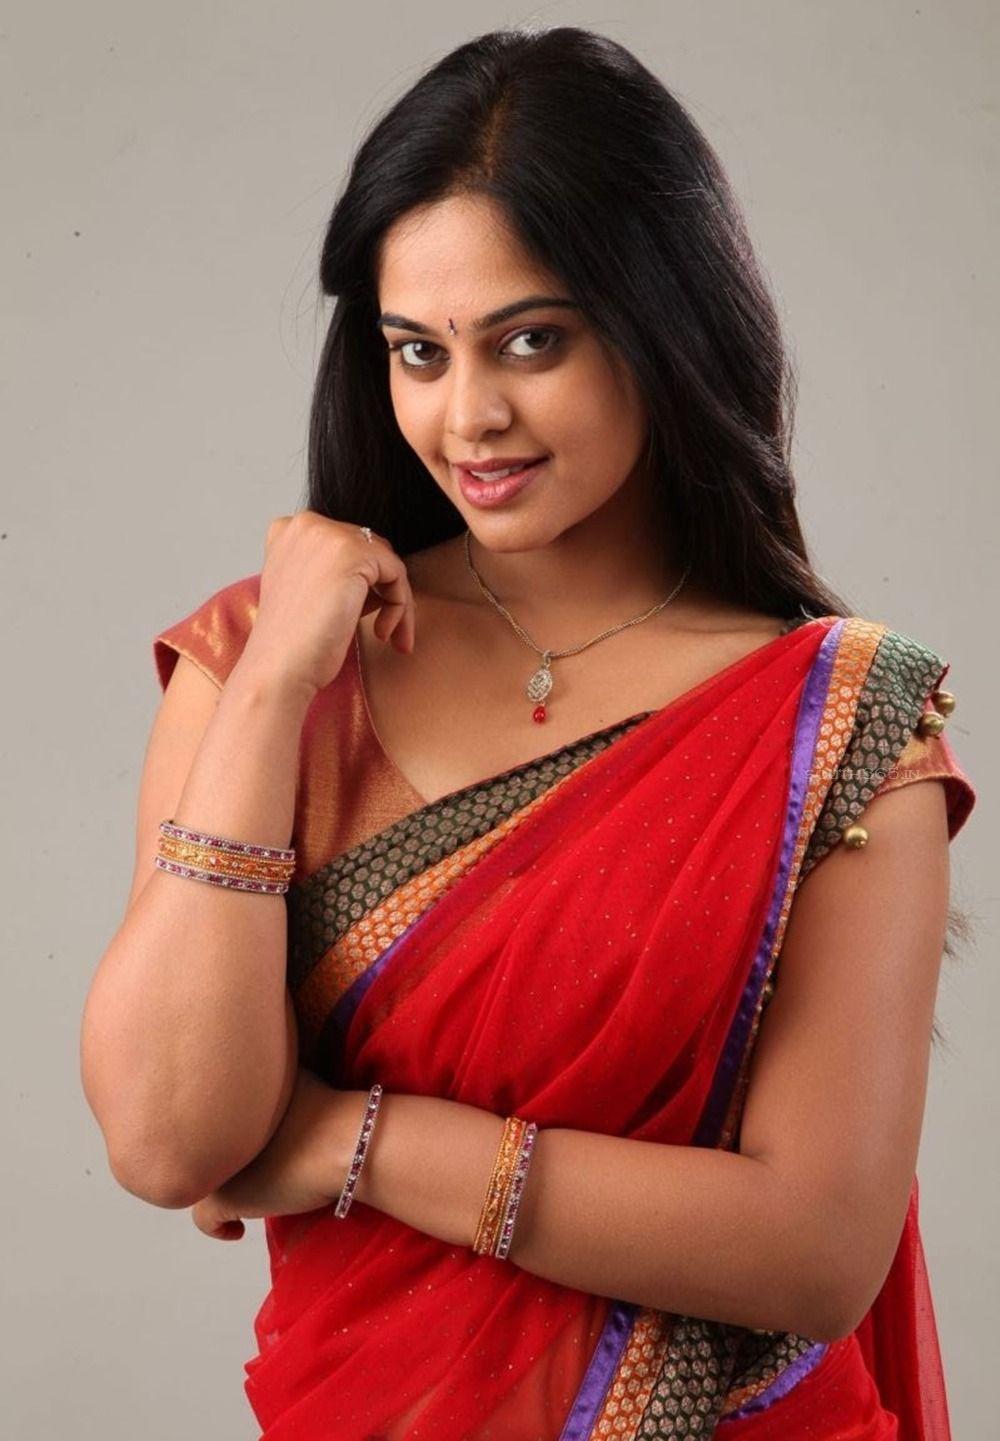 Actress Bindu Madhavi Hd Pictures From Desingu Raja Tamil Movie 2